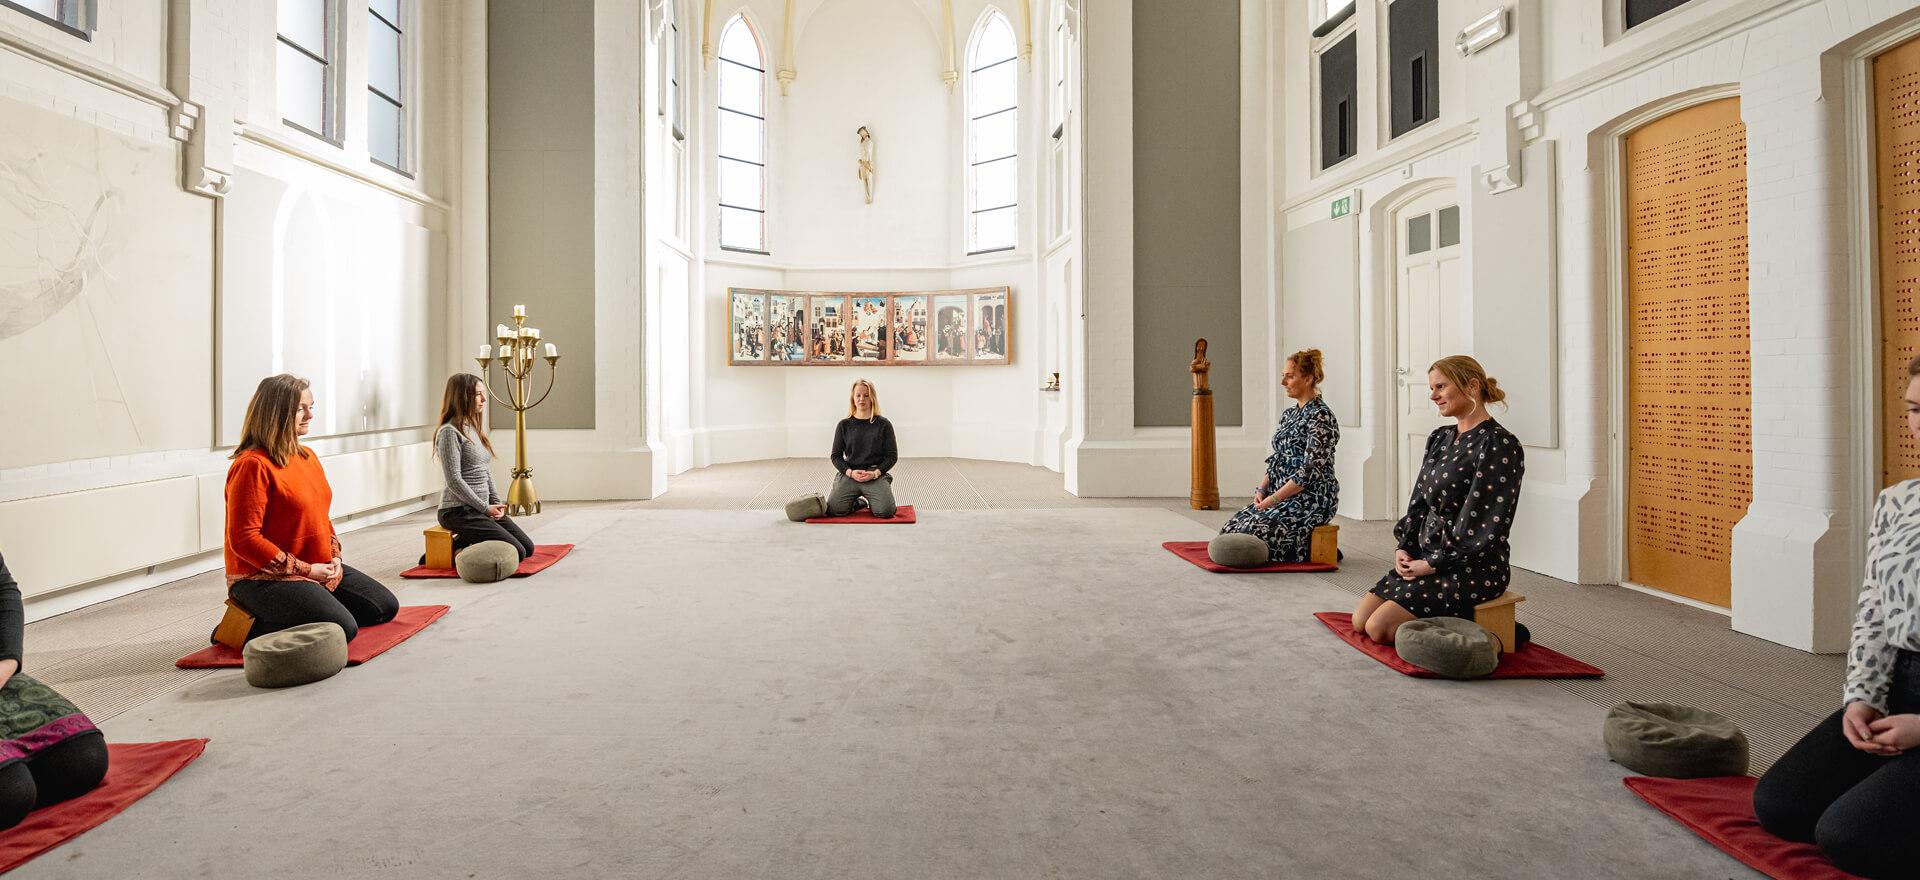 Kloosterhotel ZIN meditatie rustig kussens stil mediteren kapel